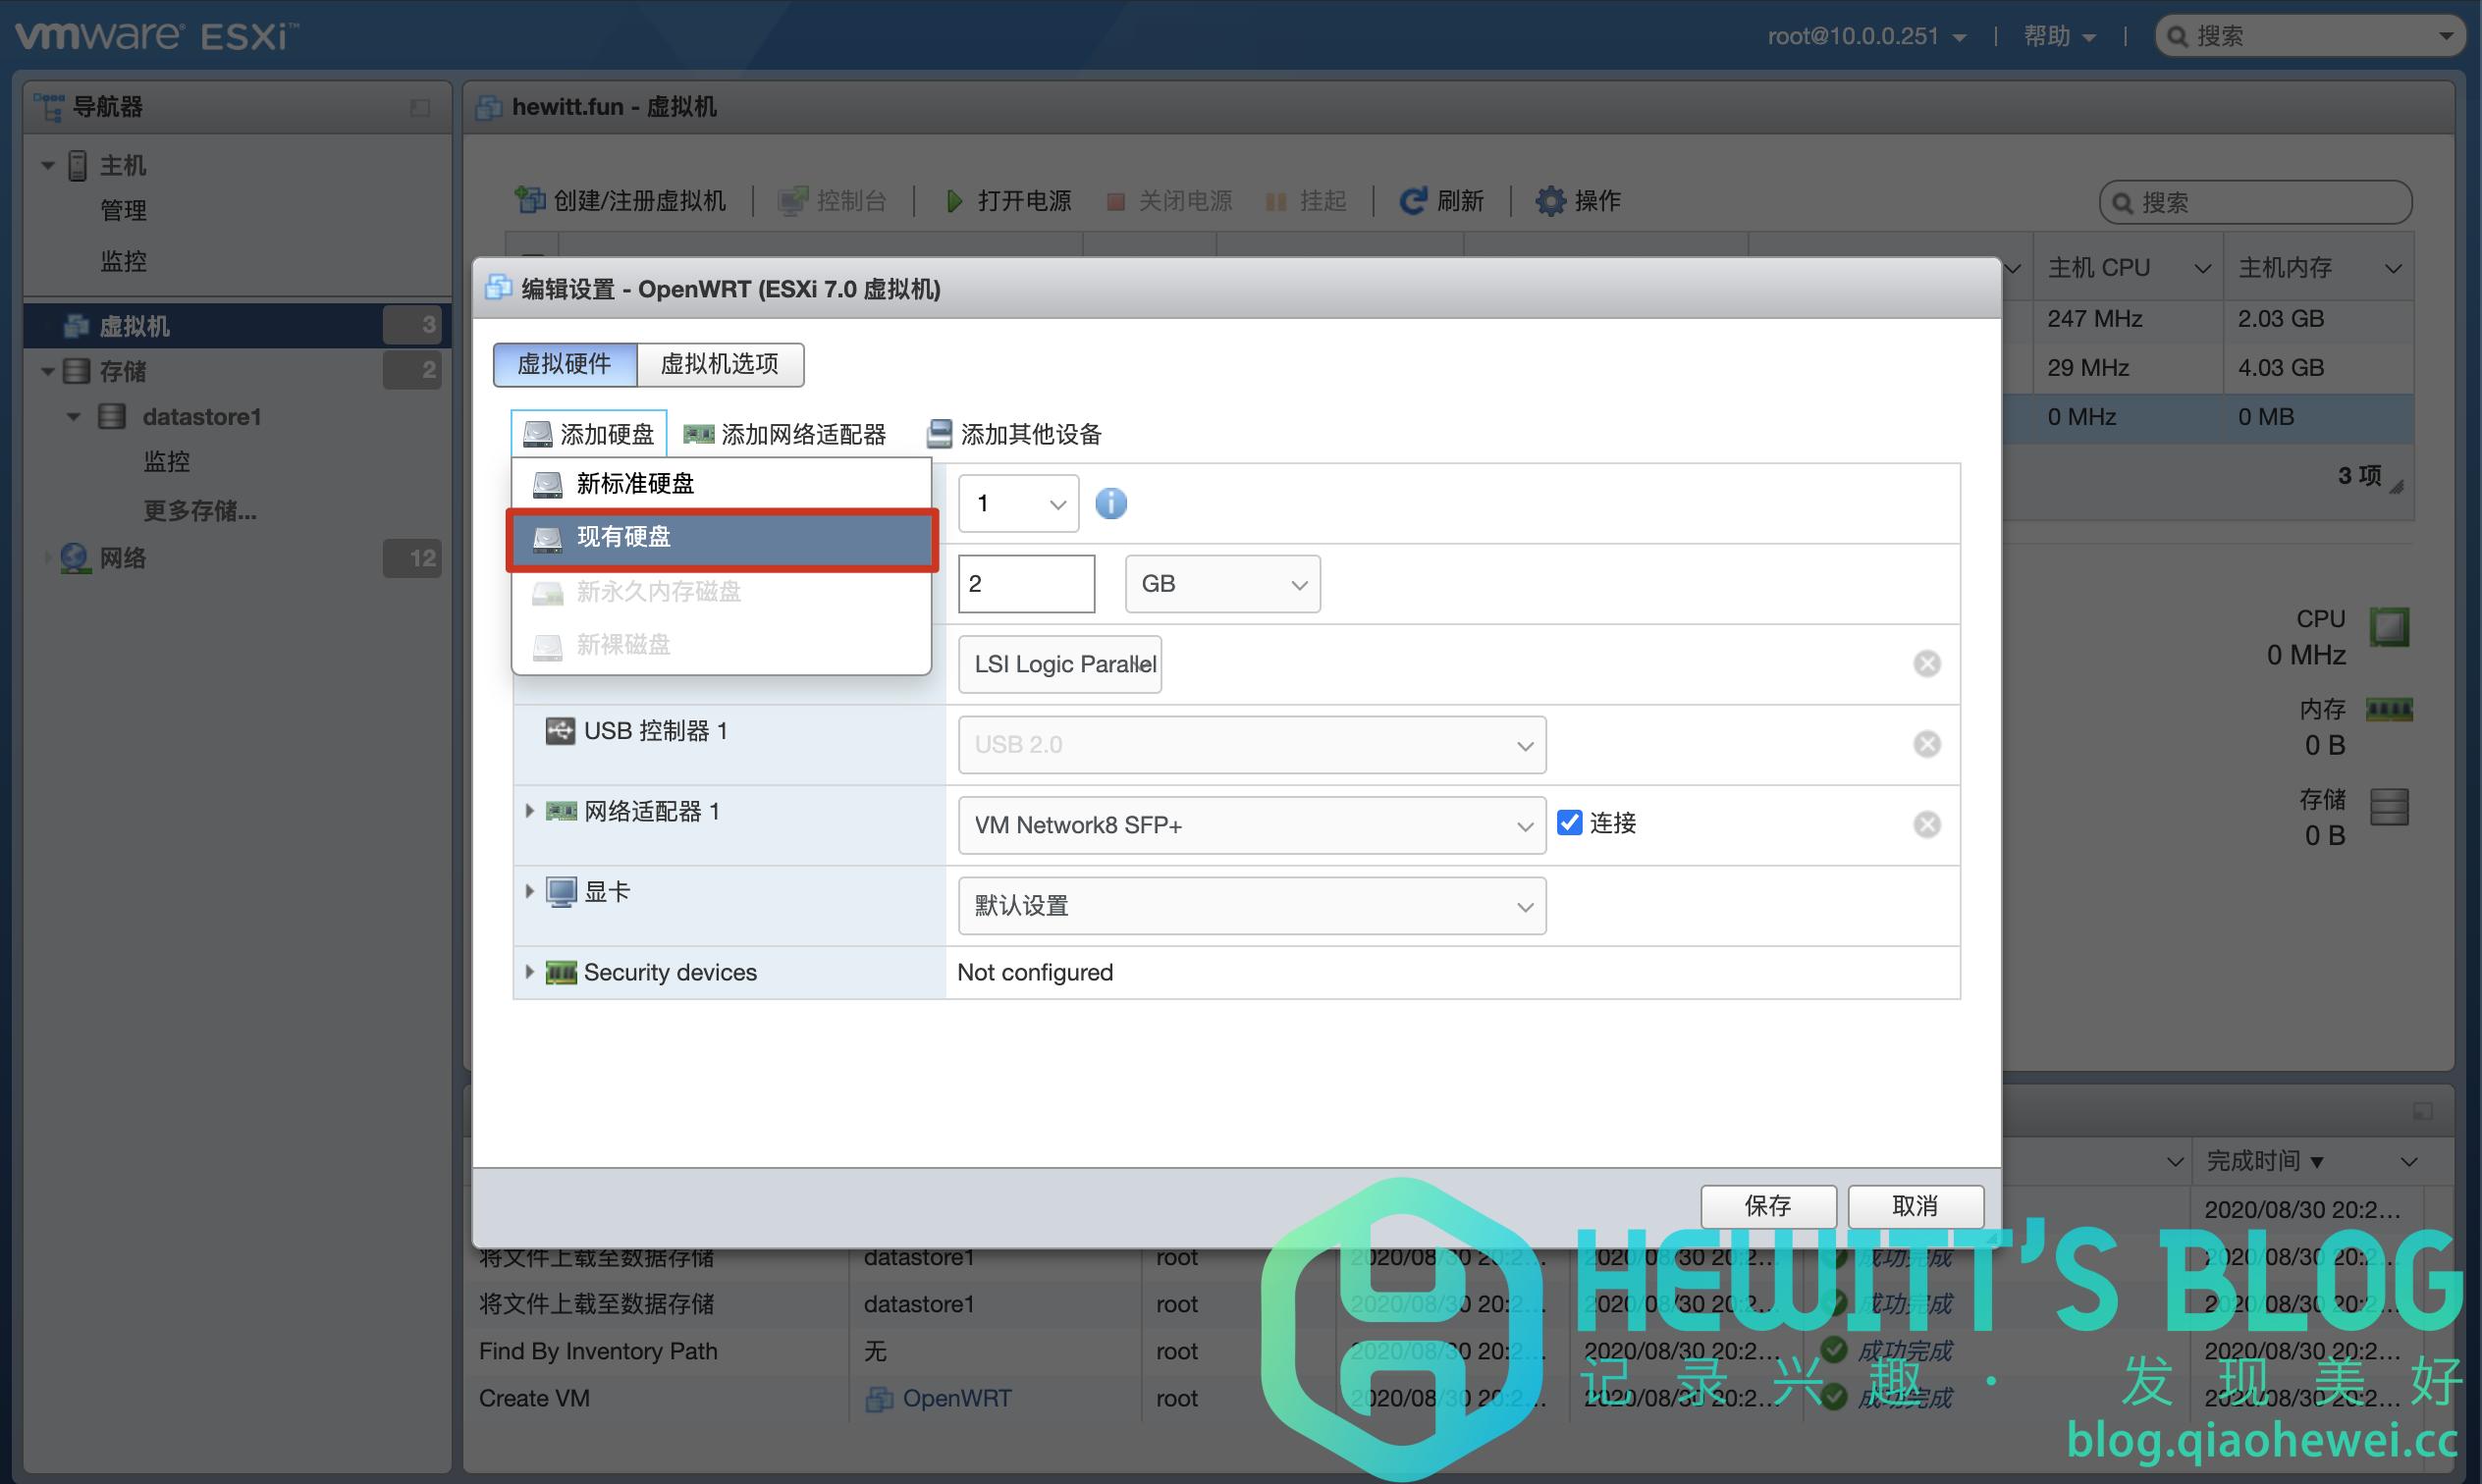 ESXI安装OpenWRT & LEDE软路由部署指南(附镜像下载)插图15